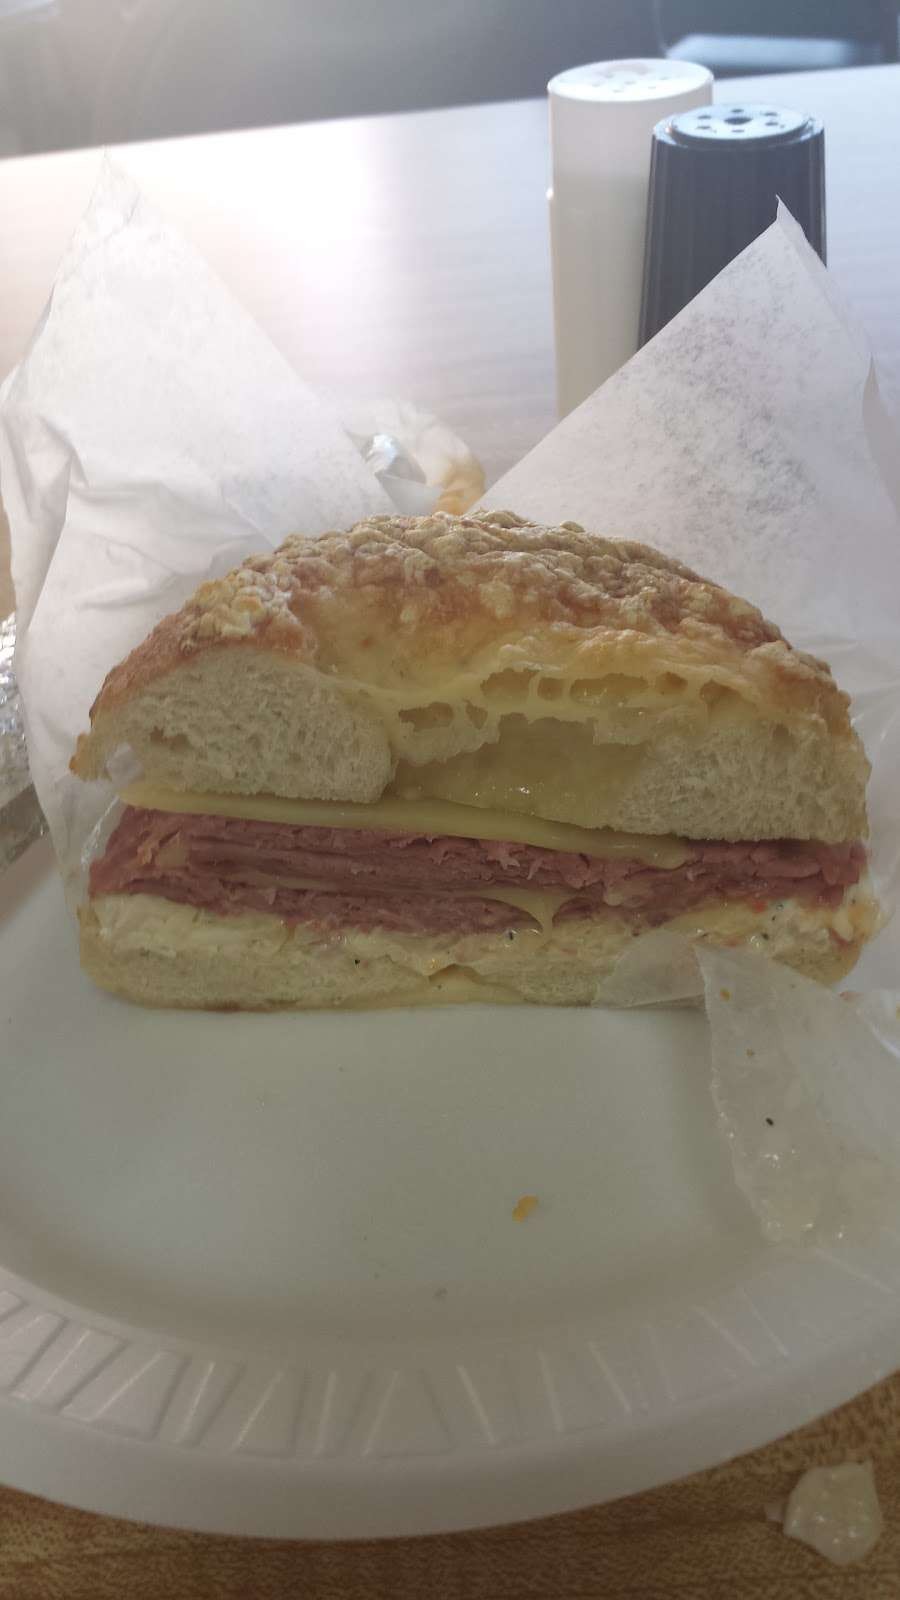 New York Bagelry - bakery  | Photo 10 of 10 | Address: 150 Kenhorst Plaza, Shillington, PA 19607, USA | Phone: (610) 775-8423